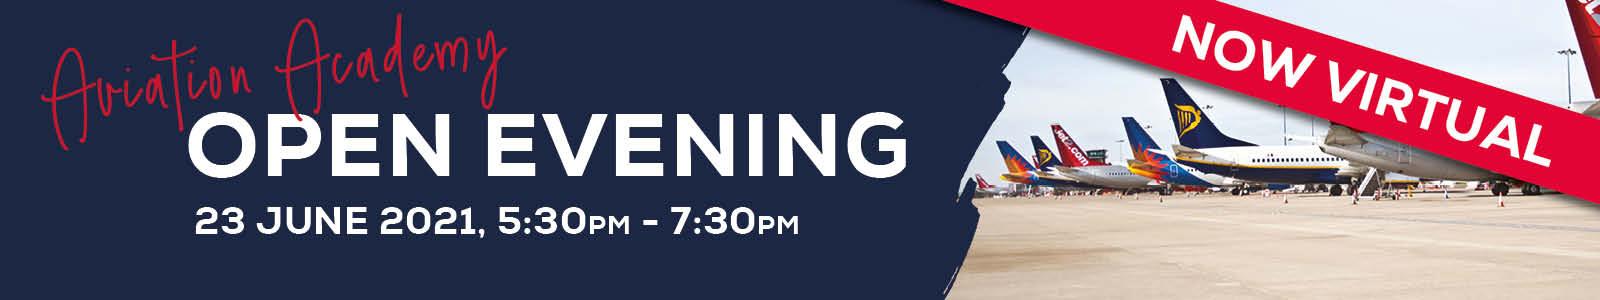 VIRTUAL Open Evening – Aviation Academy 89434